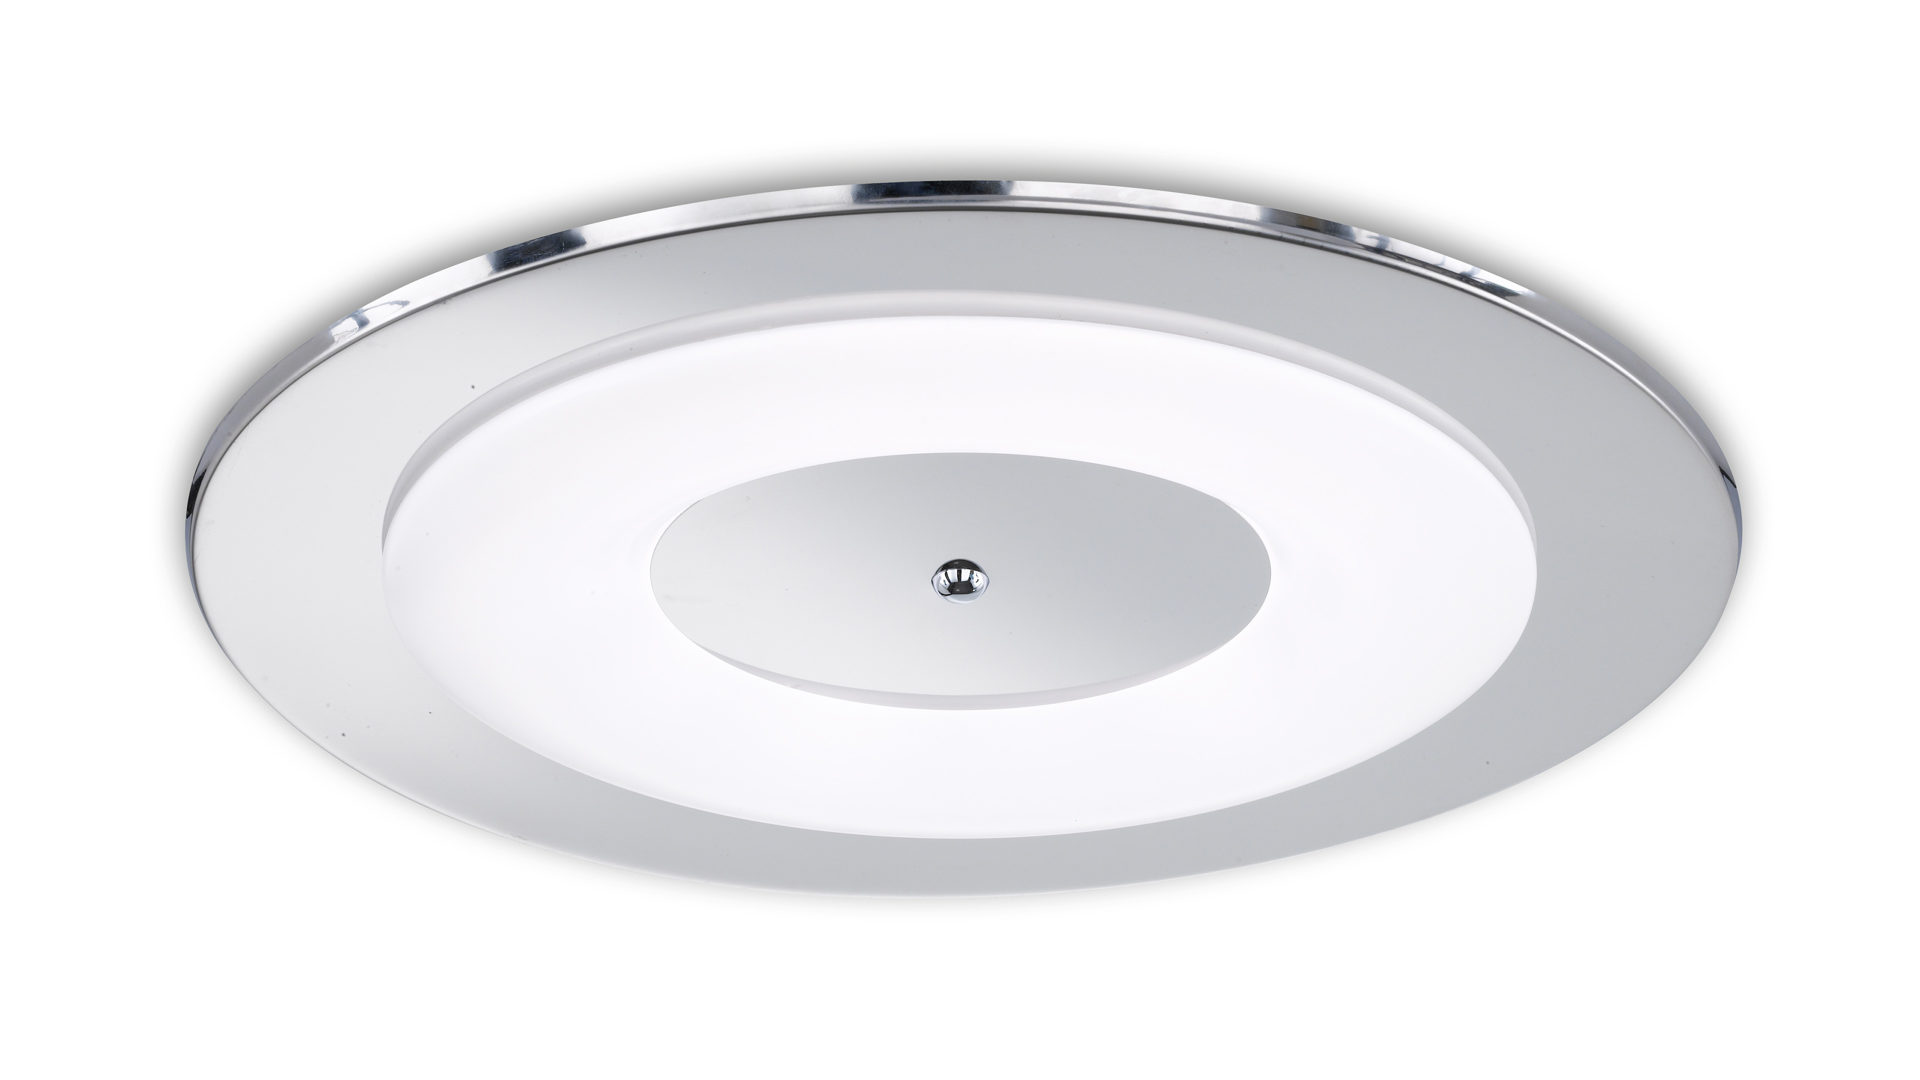 Möbel Bernskötter GmbH, Räume, Küche, Lampen + Leuchten, LED, LED ...